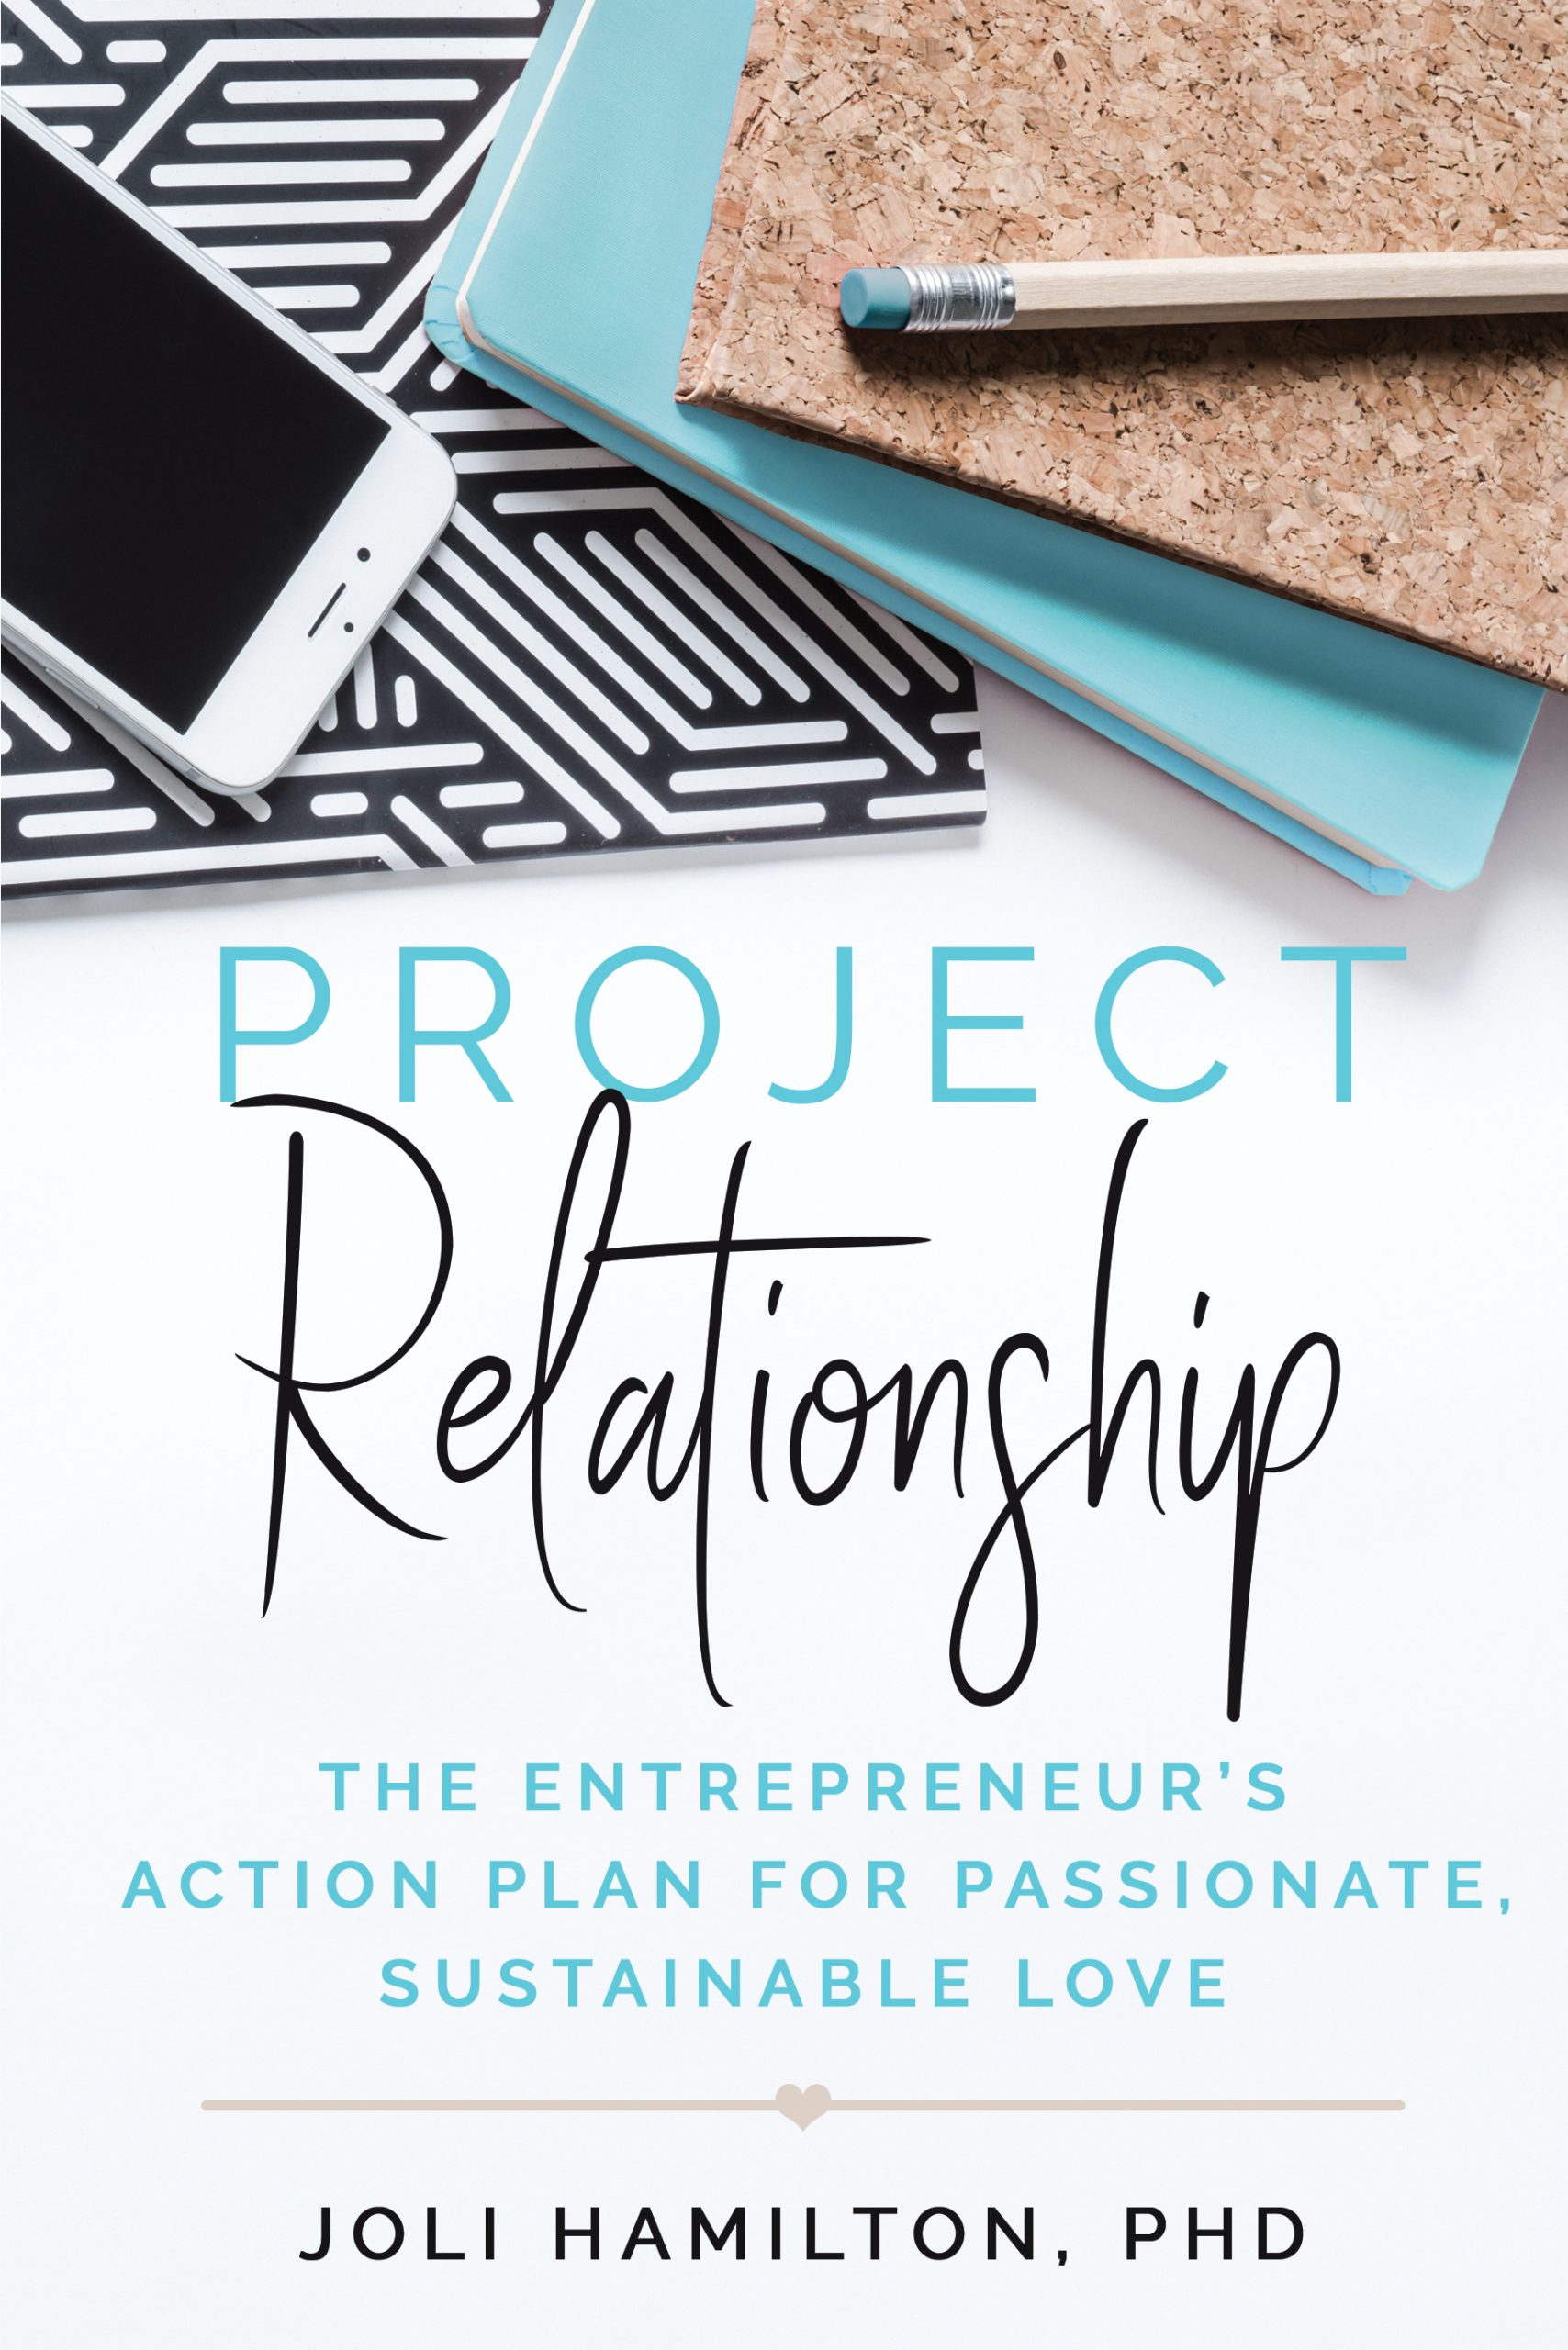 Project Relationship by Joli Hamilton